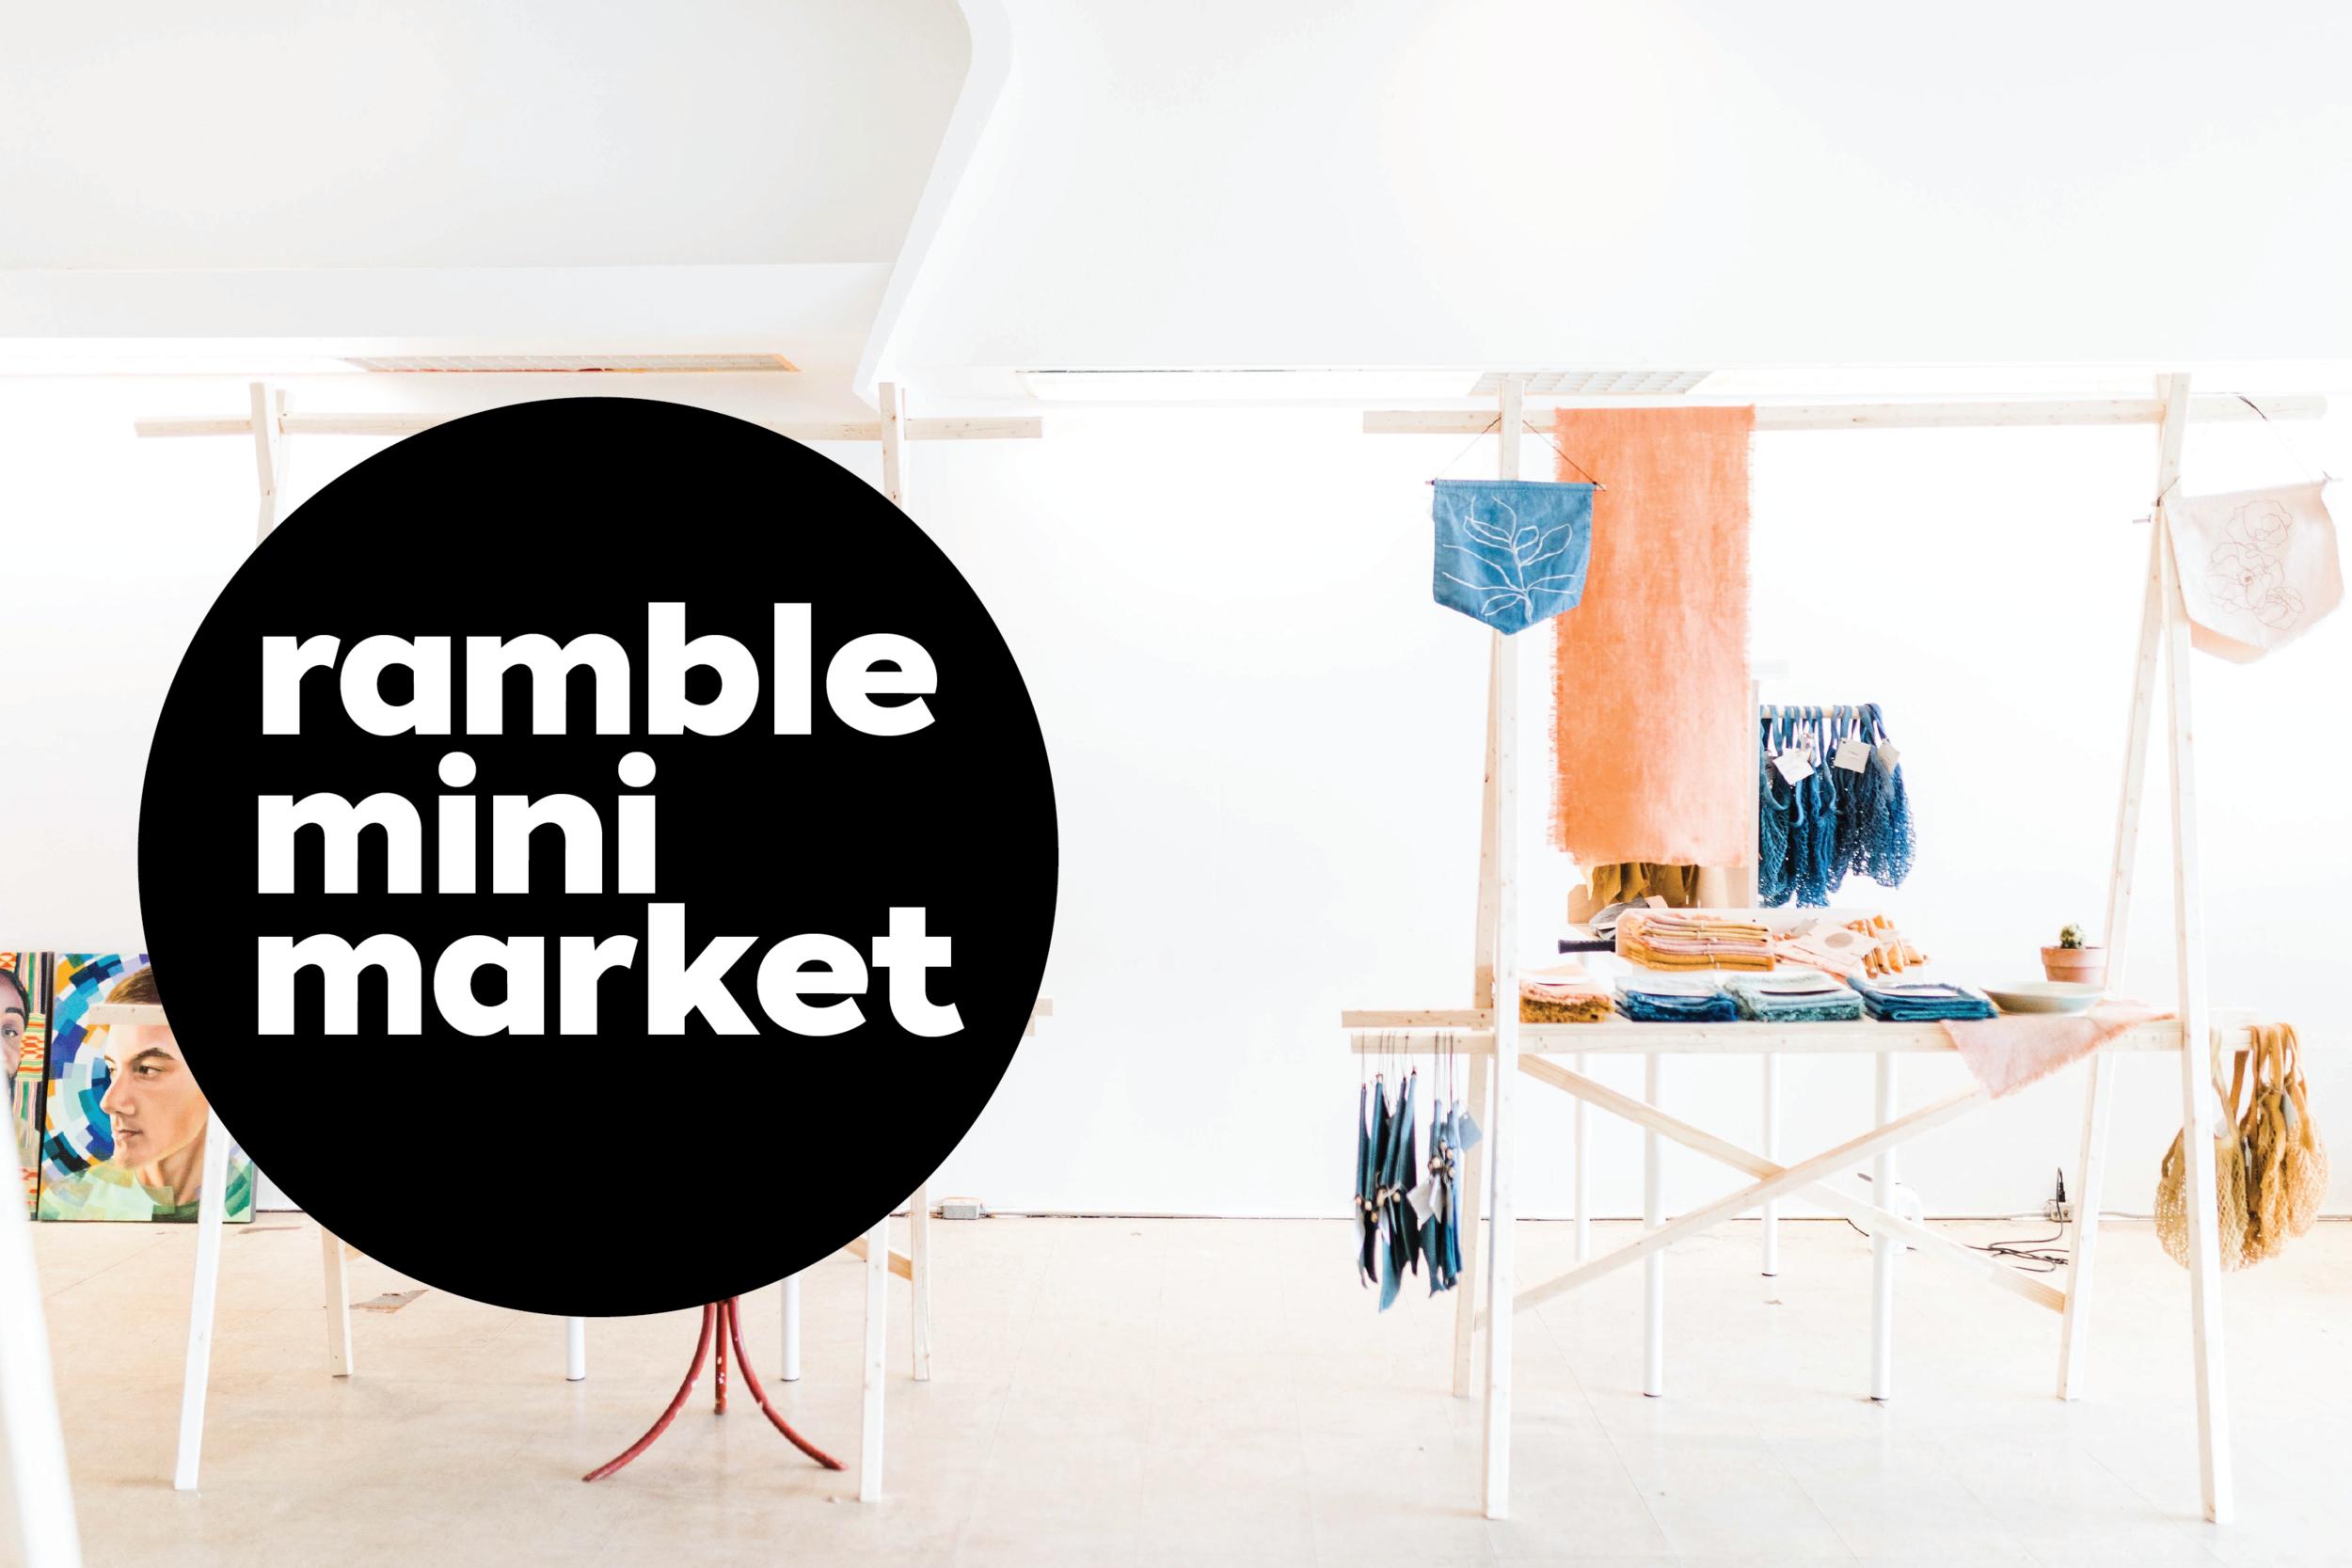 ramble mini market at ramble & co. || wichita falls, tx || pop-up shop venue